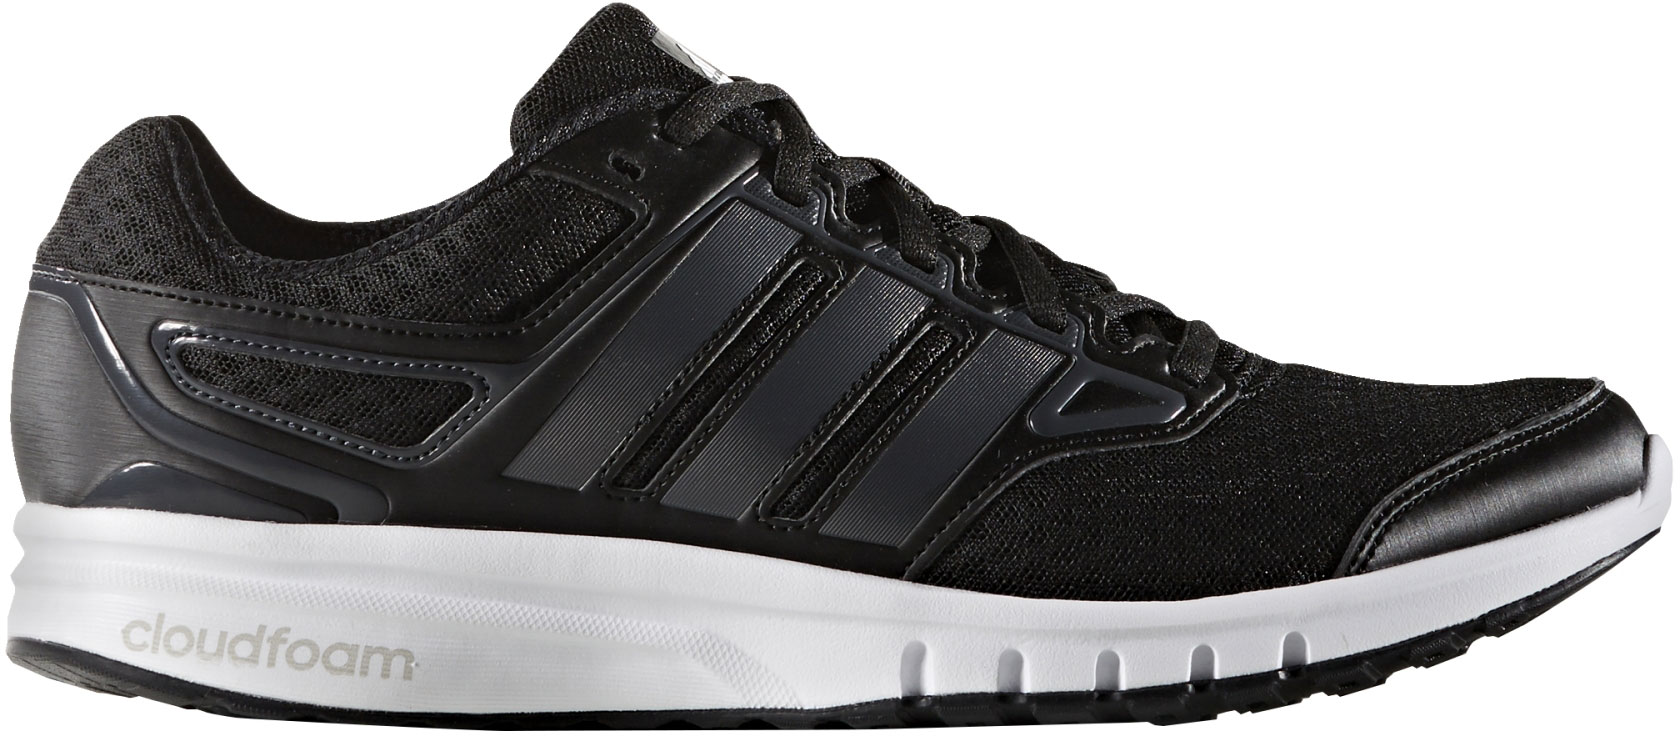 adidas GALACTIC I ELITE M. Men s running shoes d408a5827